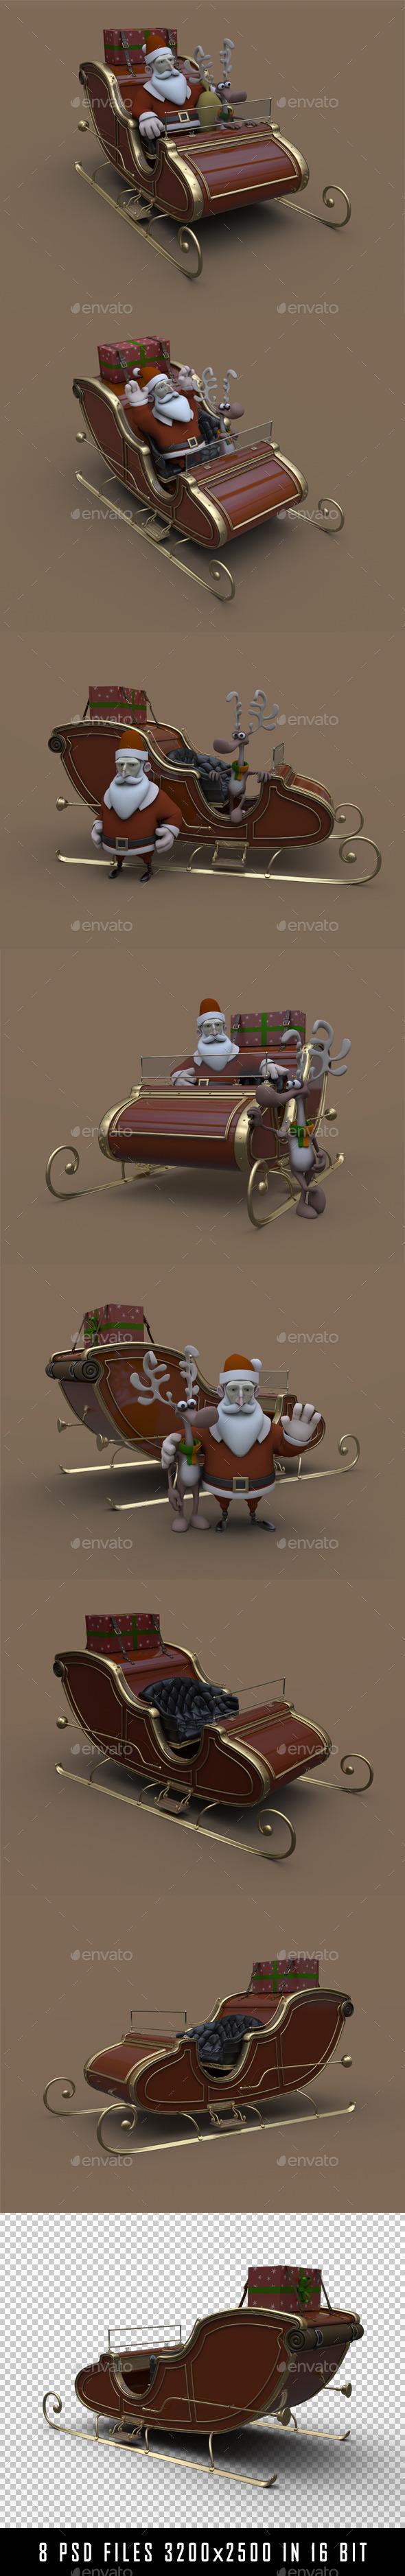 Santa's Sled - 3D Renders Graphics